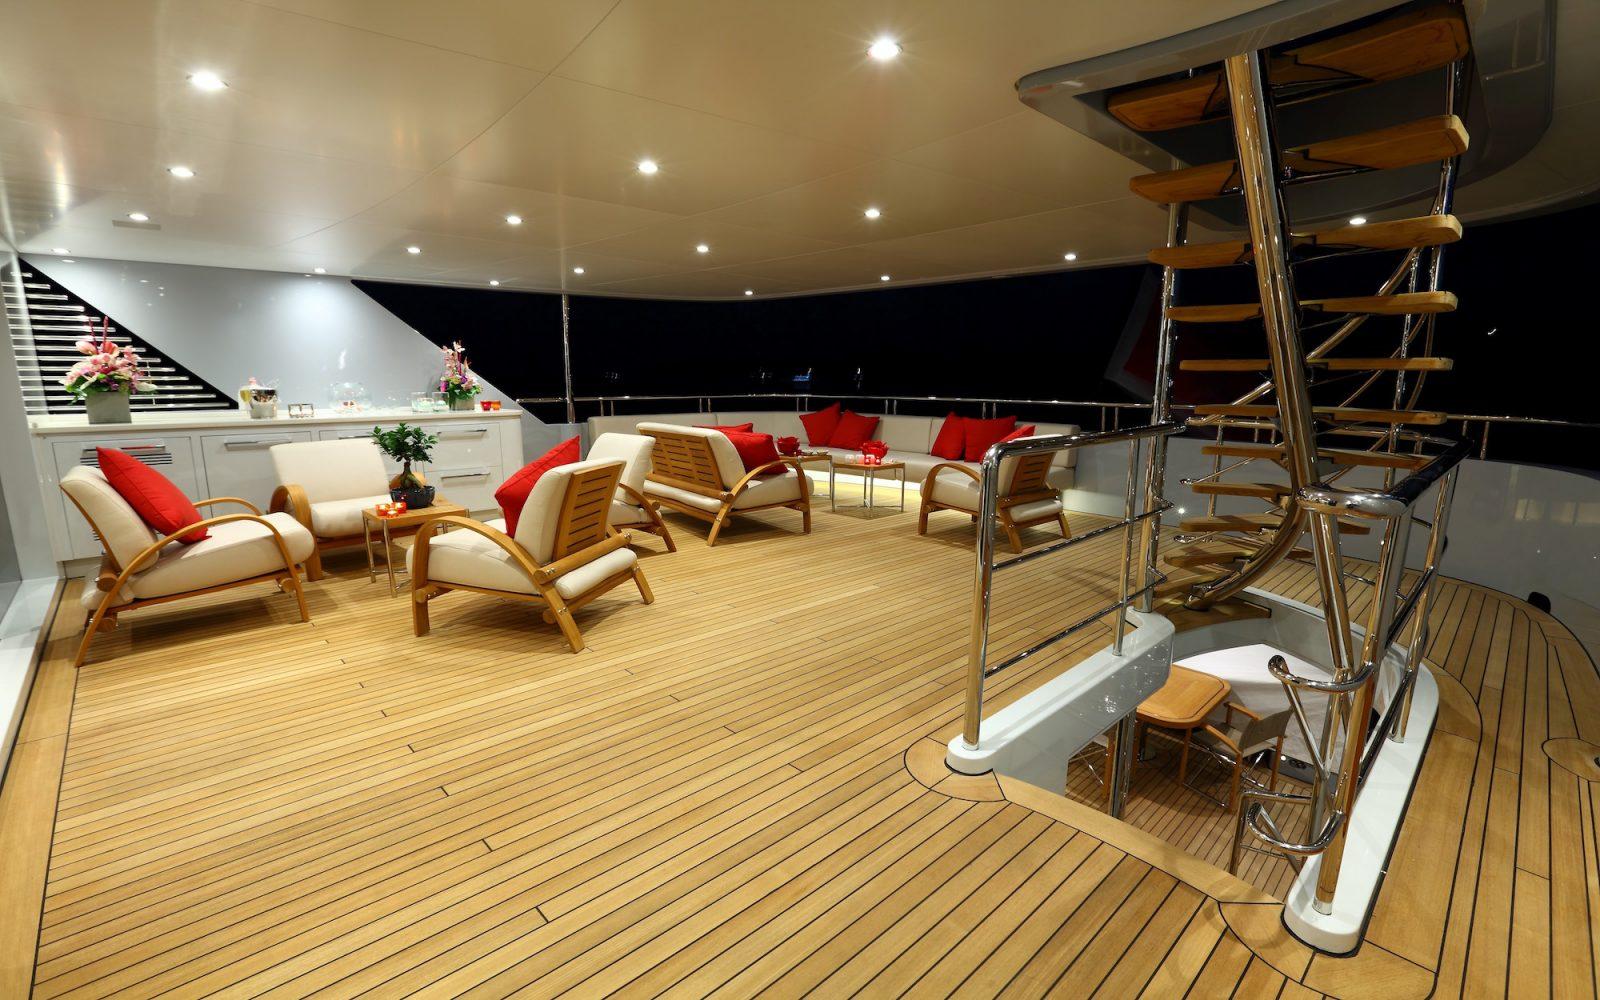 2 LADIES upper deck | 2 LADIES